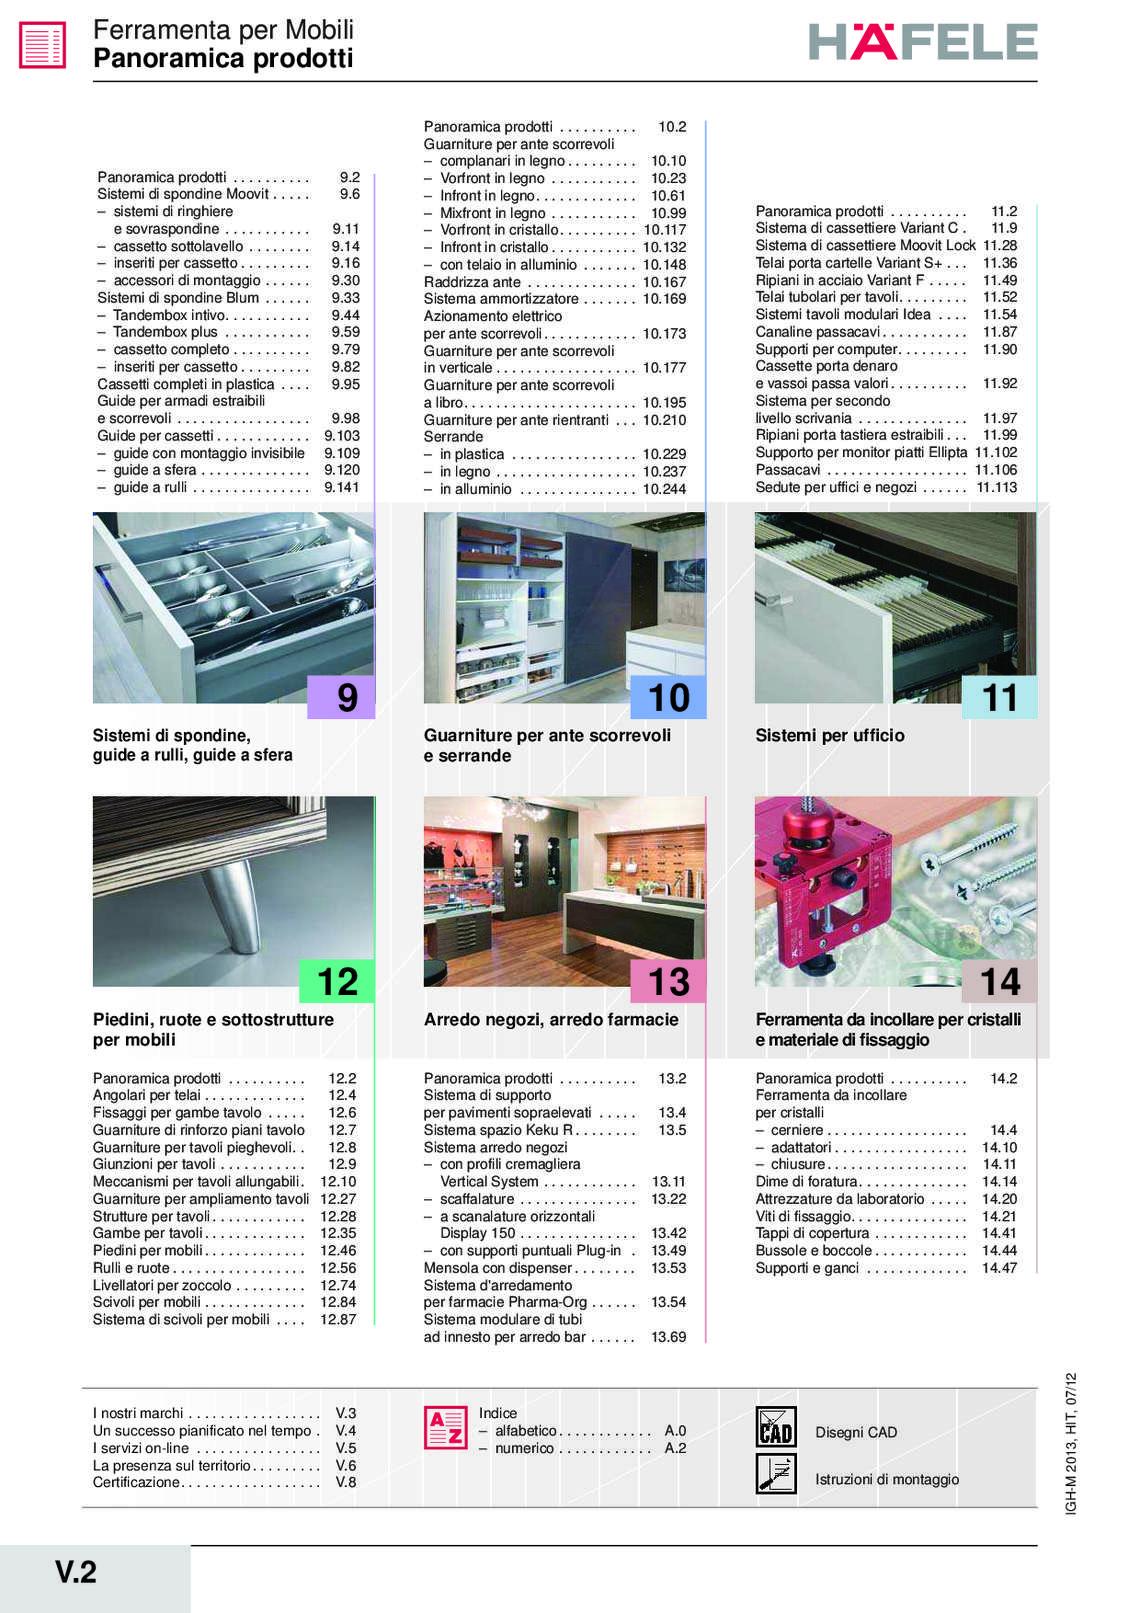 hafele-arredo-negozi-e-farmacie_32_003.jpg